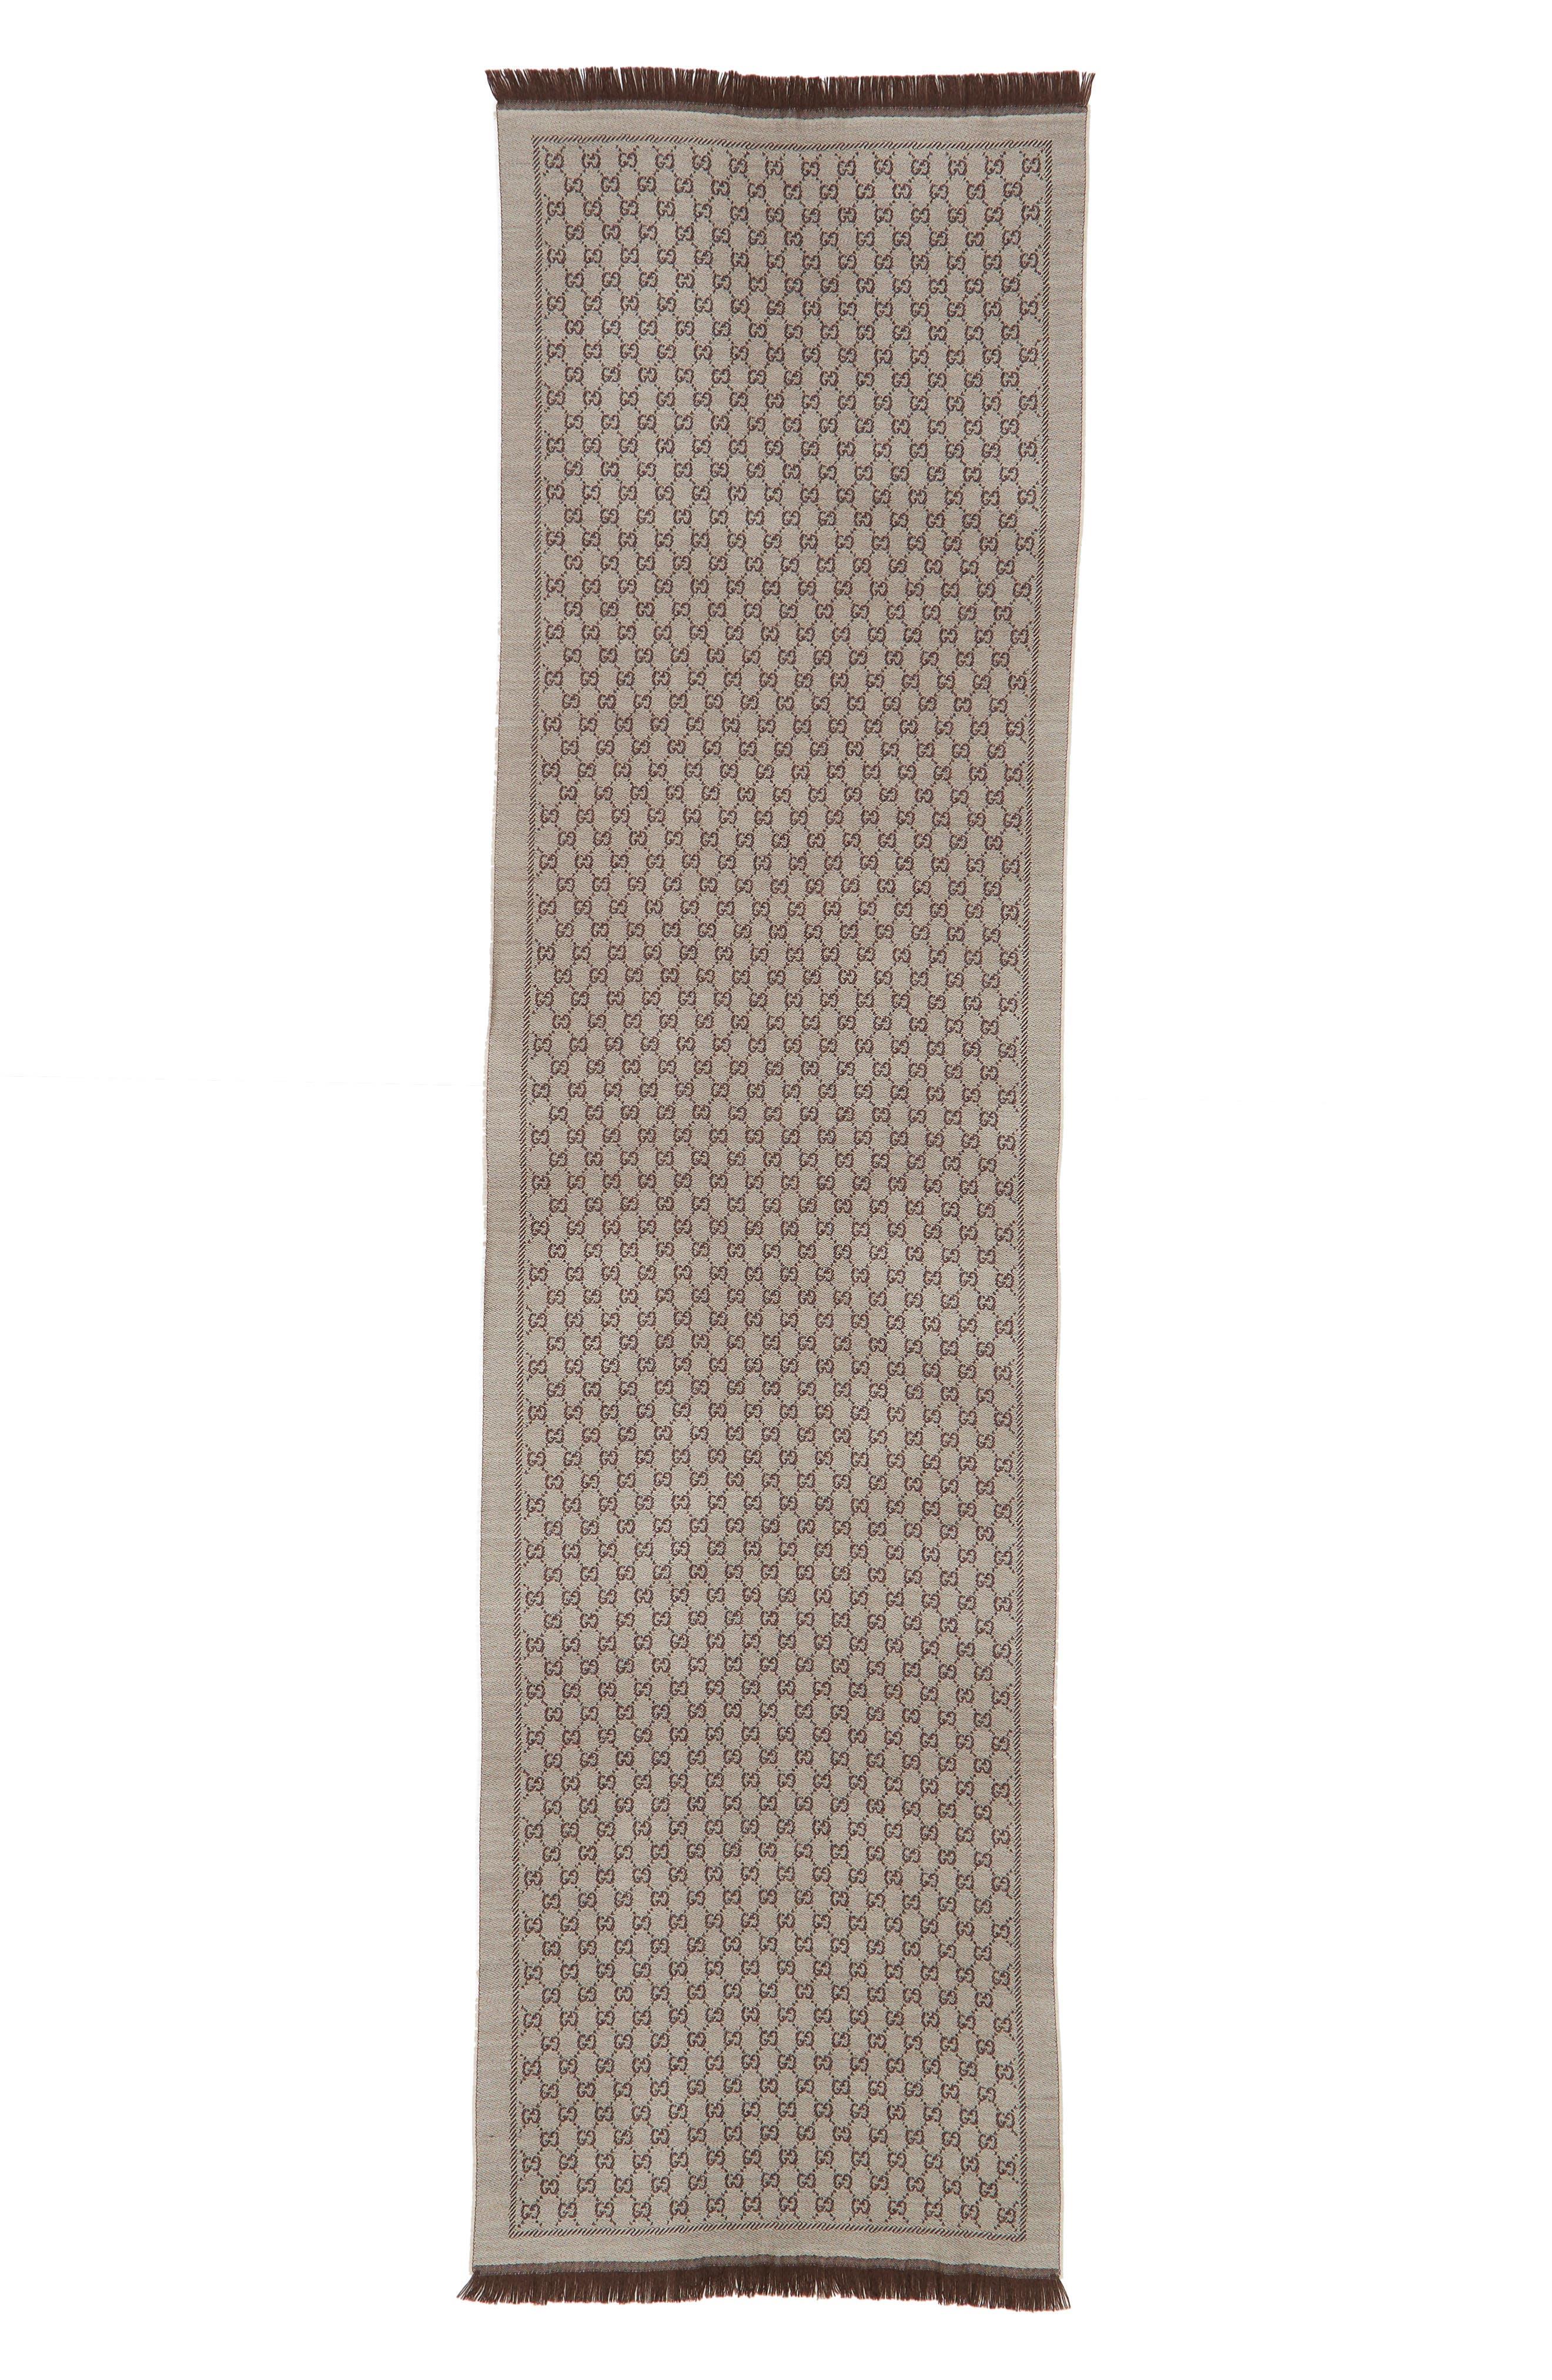 GG Jacquard Wool Scarf,                             Main thumbnail 1, color,                             BEIGE/ DARK BROWN